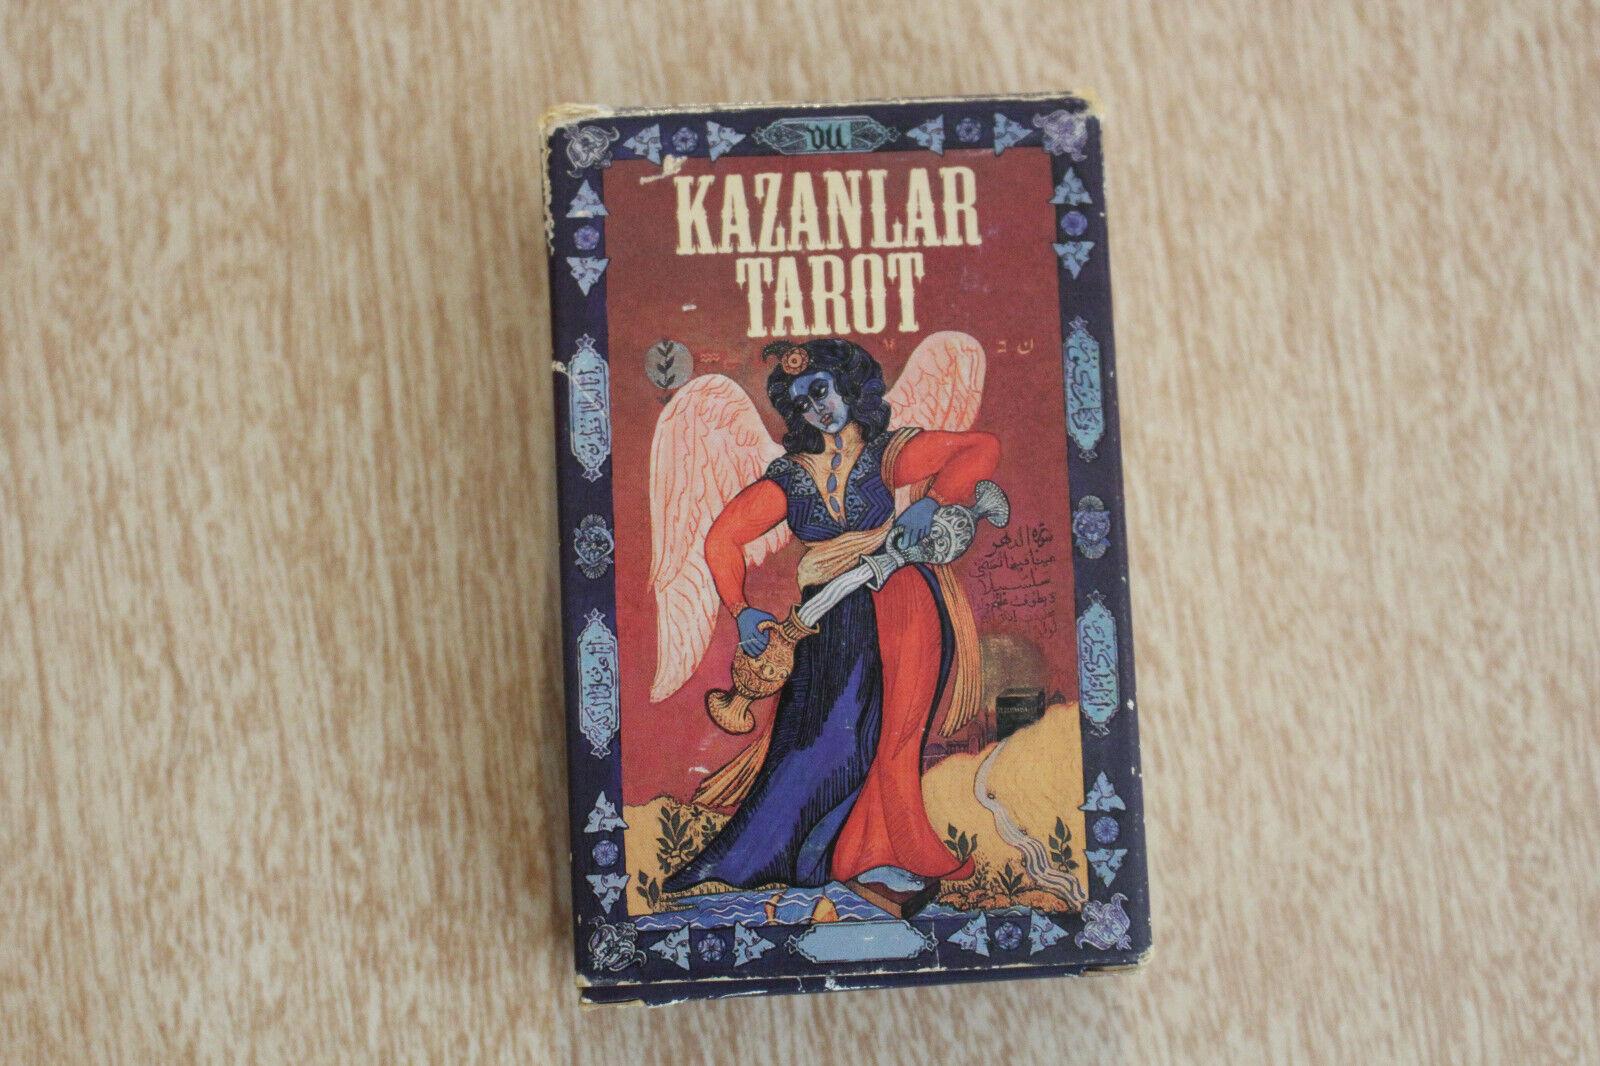 Kazanlar Tarosso - Rare and Out of Print